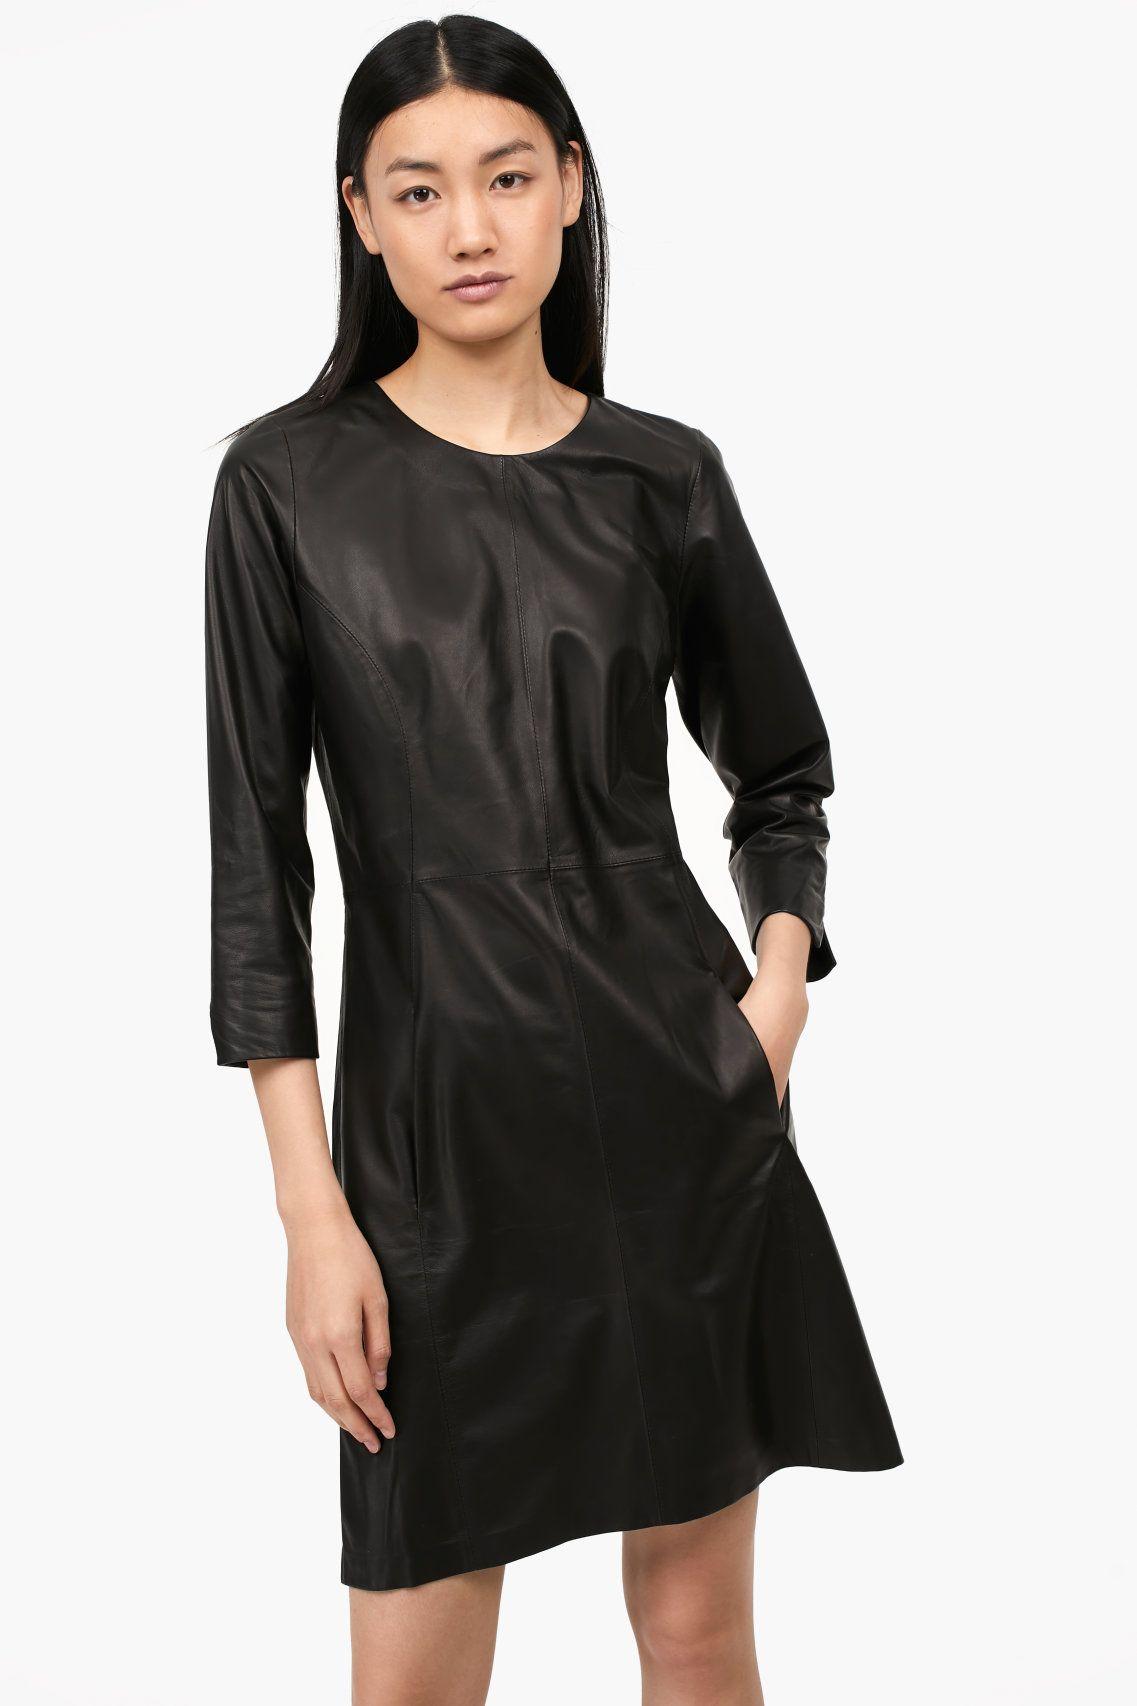 Damen CLOSED Kleid aus Lammleder black | 4054736487464 | Pinterest ...